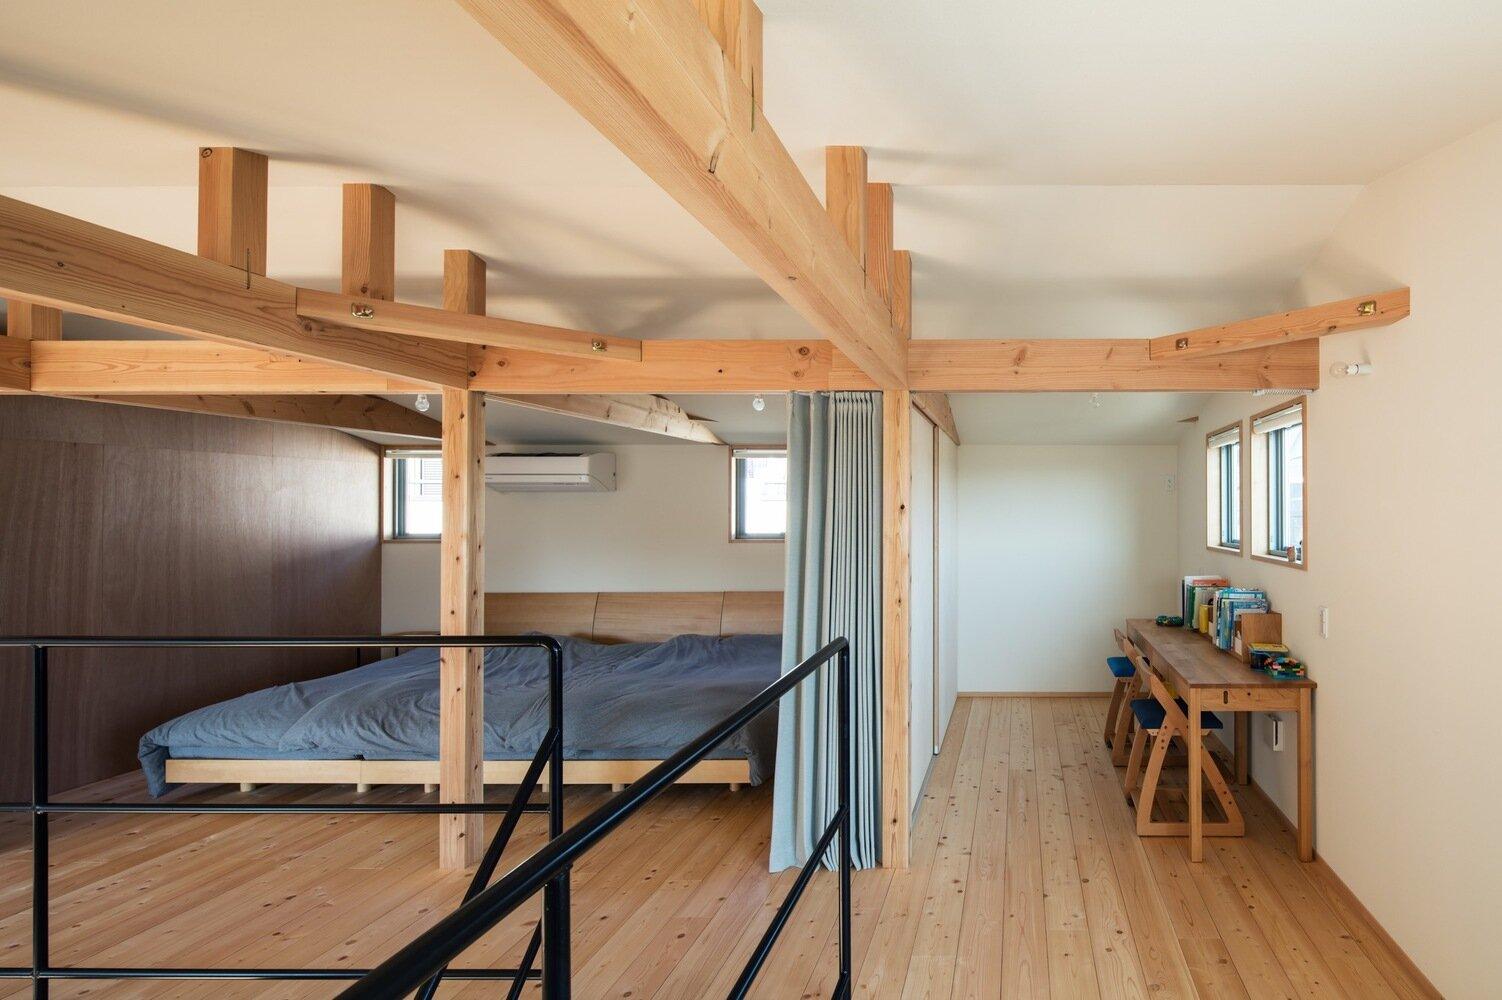 S-House - Coil Kazuteru Matumura Architects - Japan - Bedroom - Humble Homes